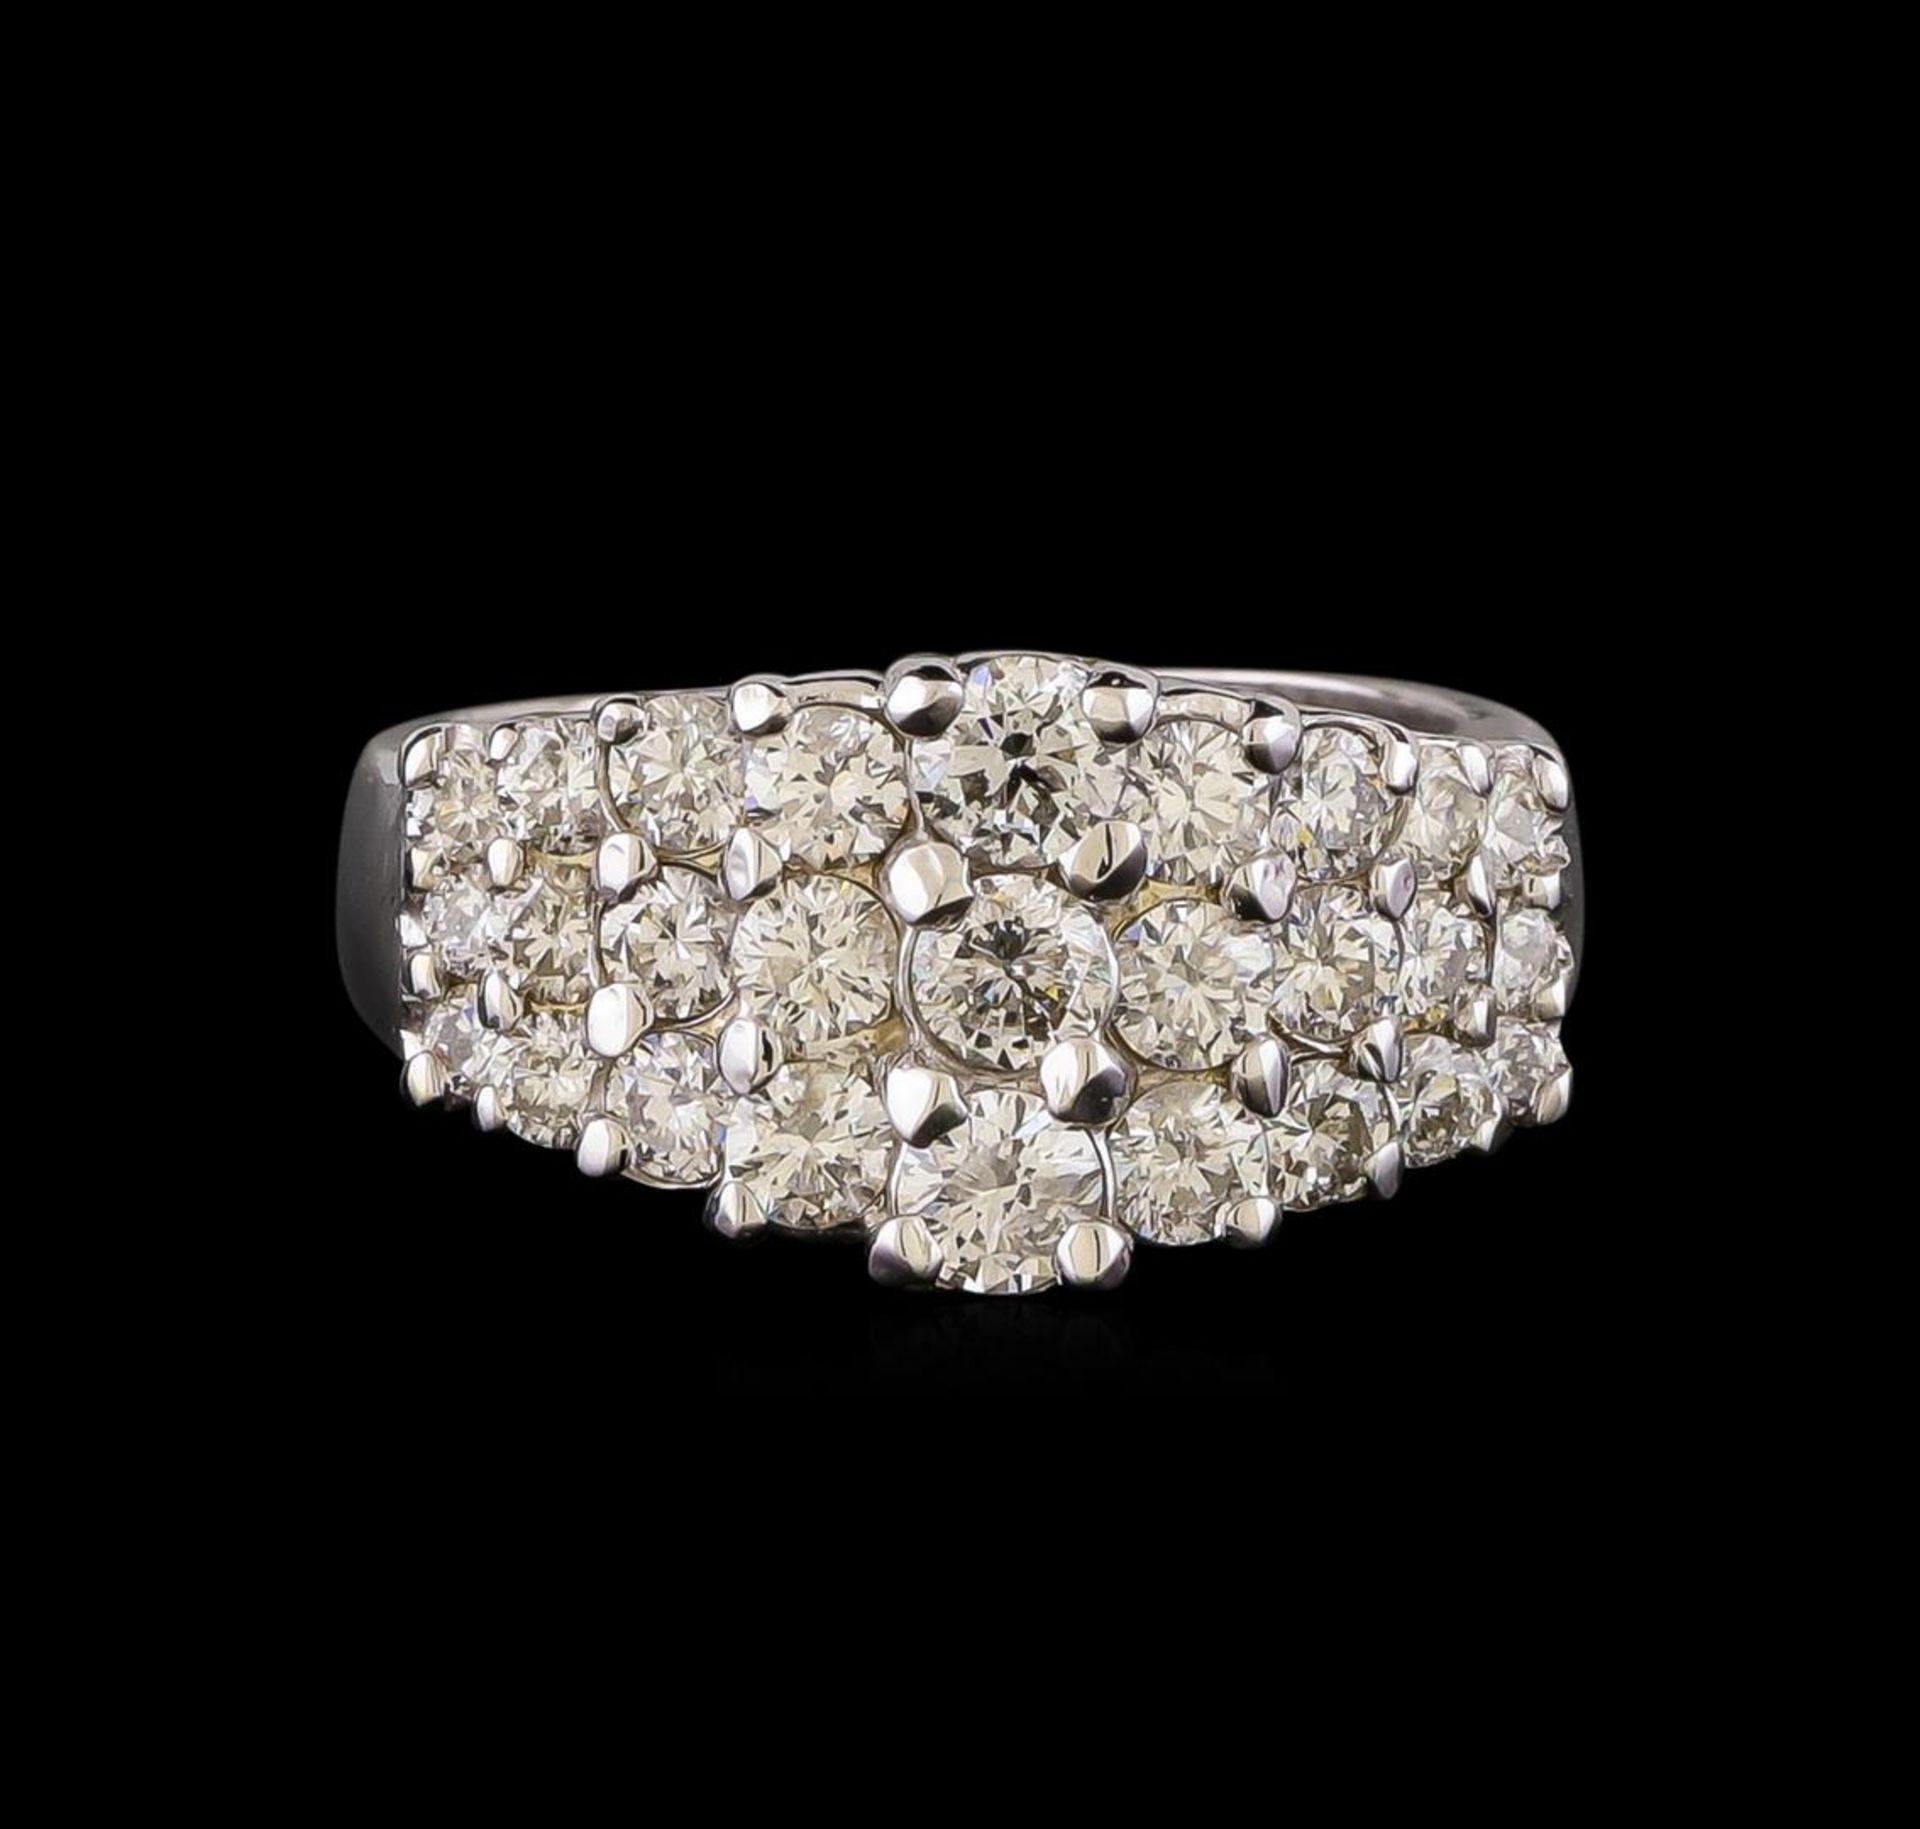 14KT White Gold 1.00 ctw Diamond Ring - Image 2 of 5